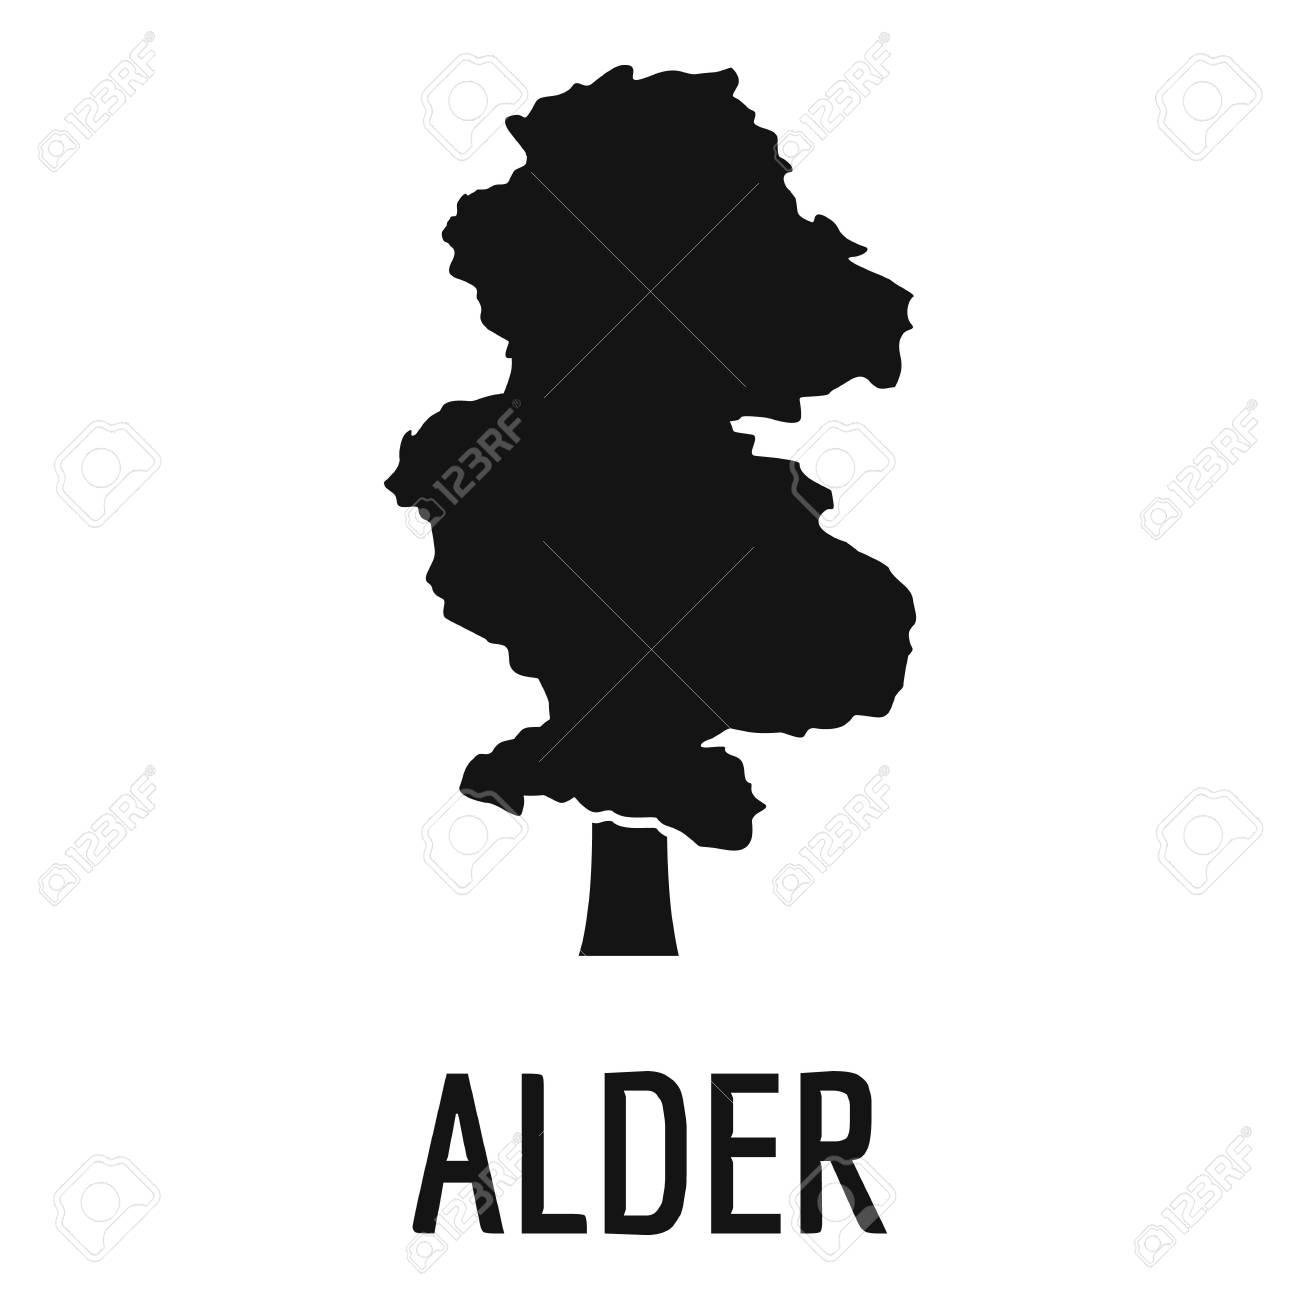 Alder tree icon. Simple illustration of alder tree icon for web. - 91740197